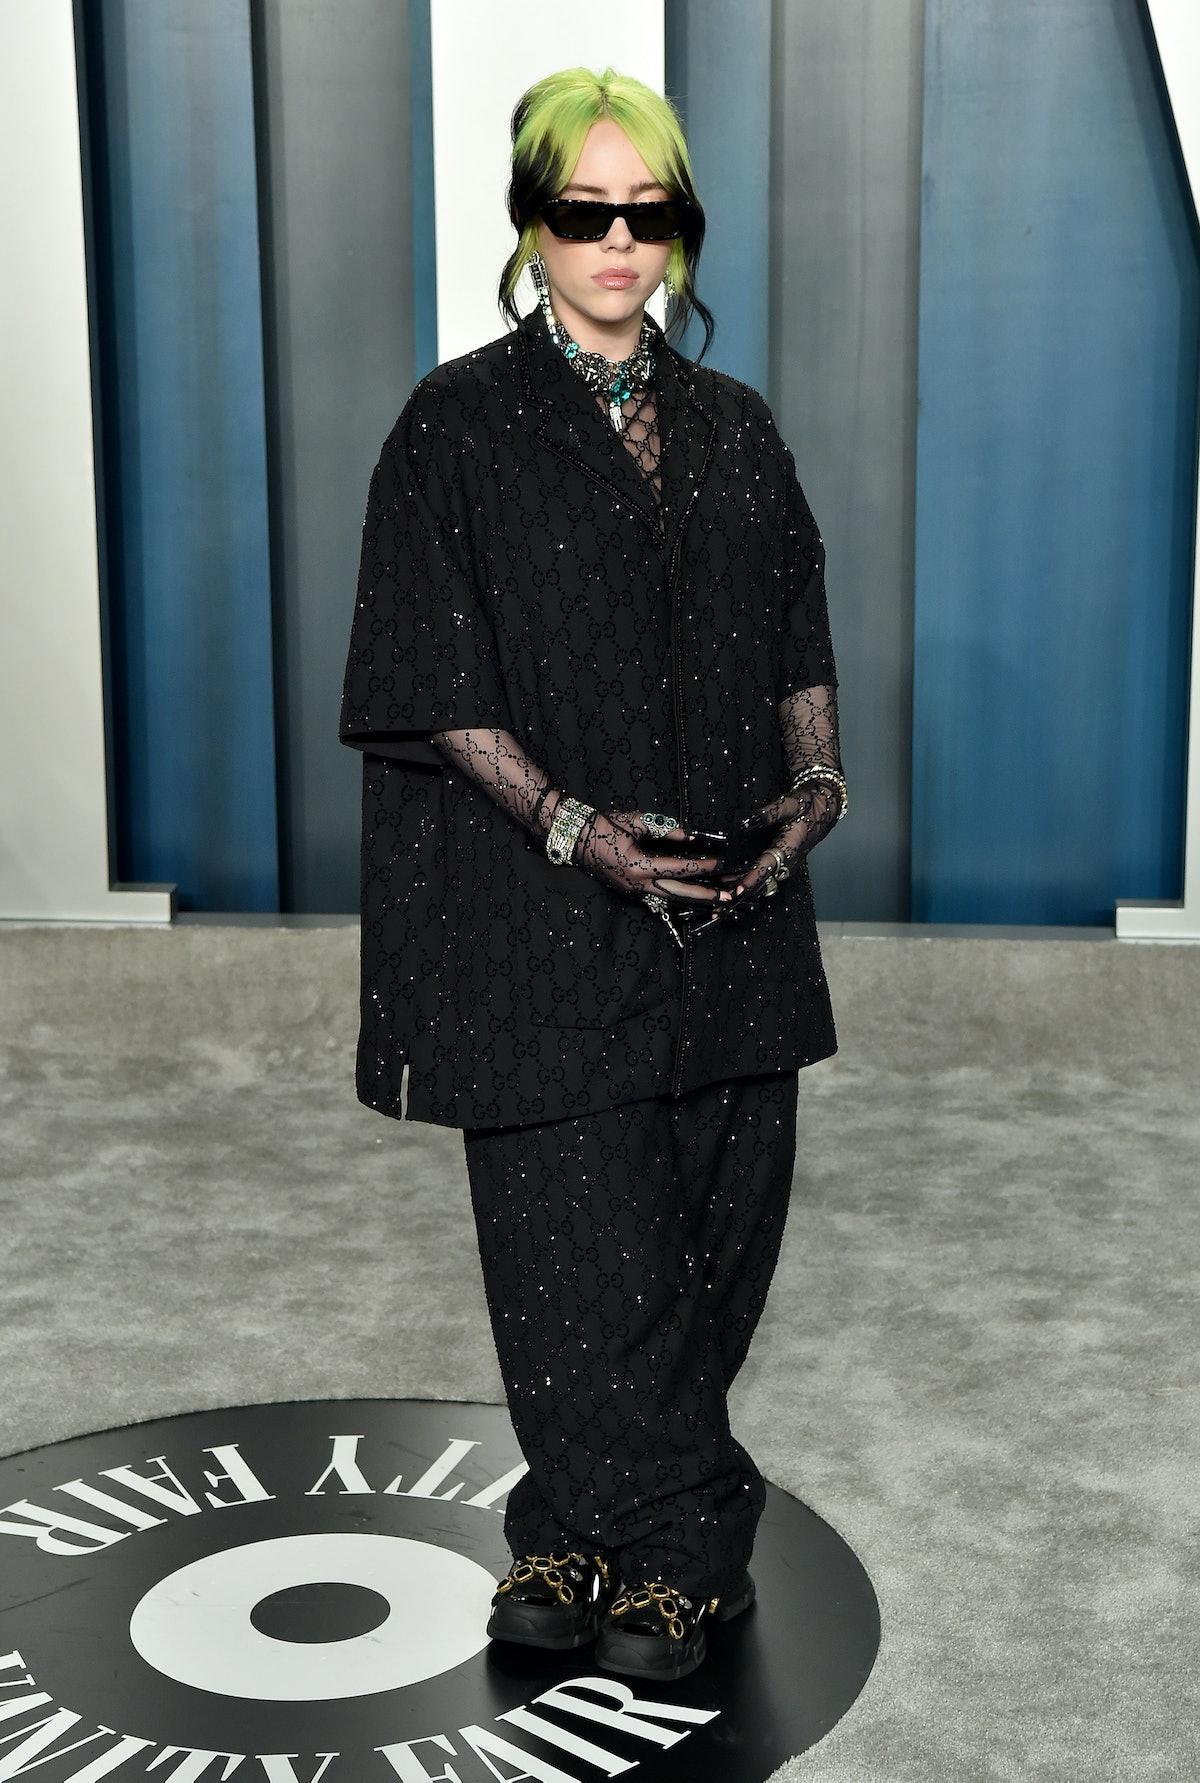 Billie Eilish attends the 2020 Vanity Fair Oscar Party hosted by Radhika Jones at Wallis Annenberg C...